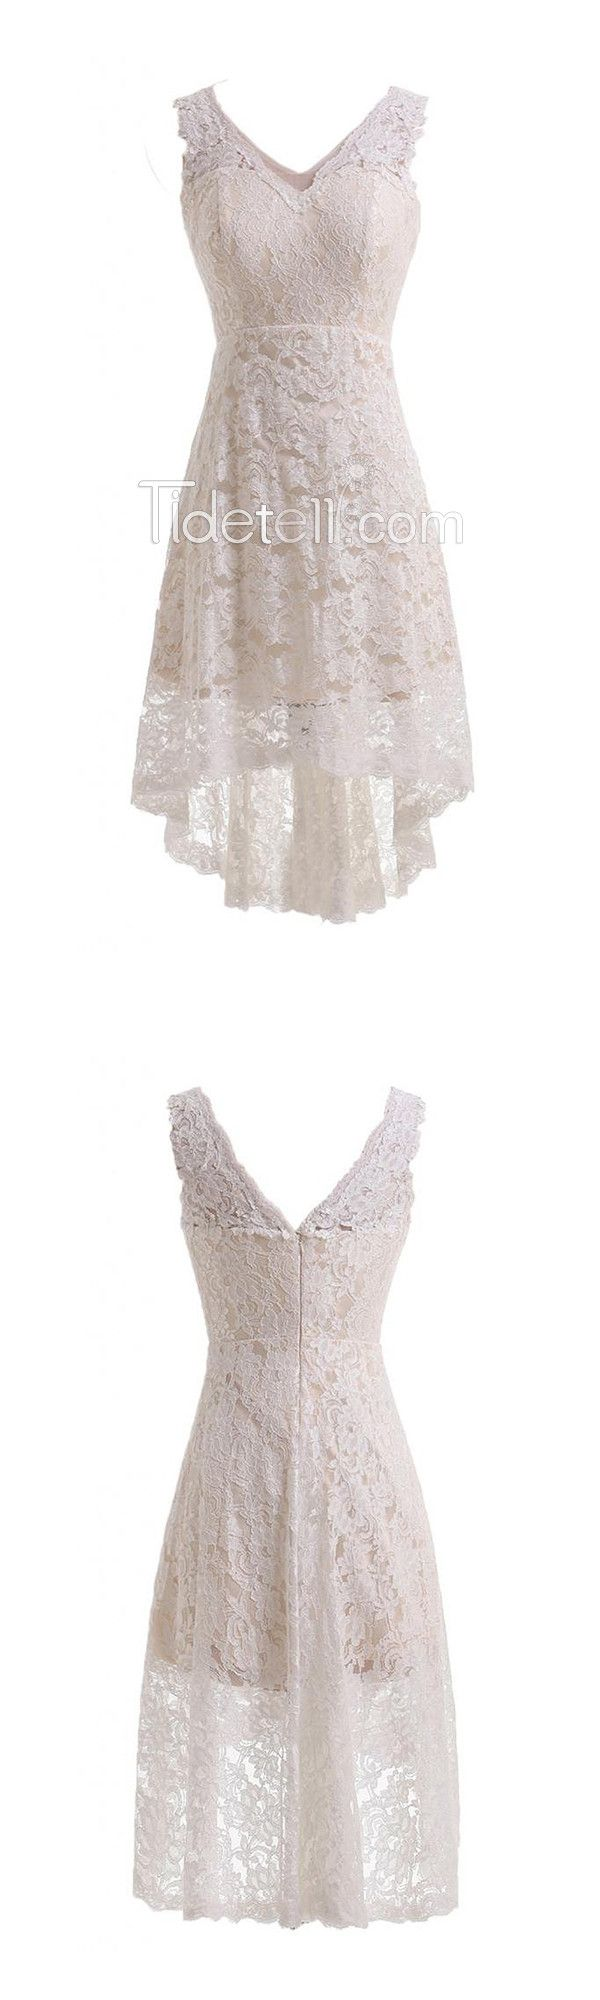 wedding dresses,lace party dresses,cheap wedding dresses,simple wedding dresses,cute short lace wedding dresses